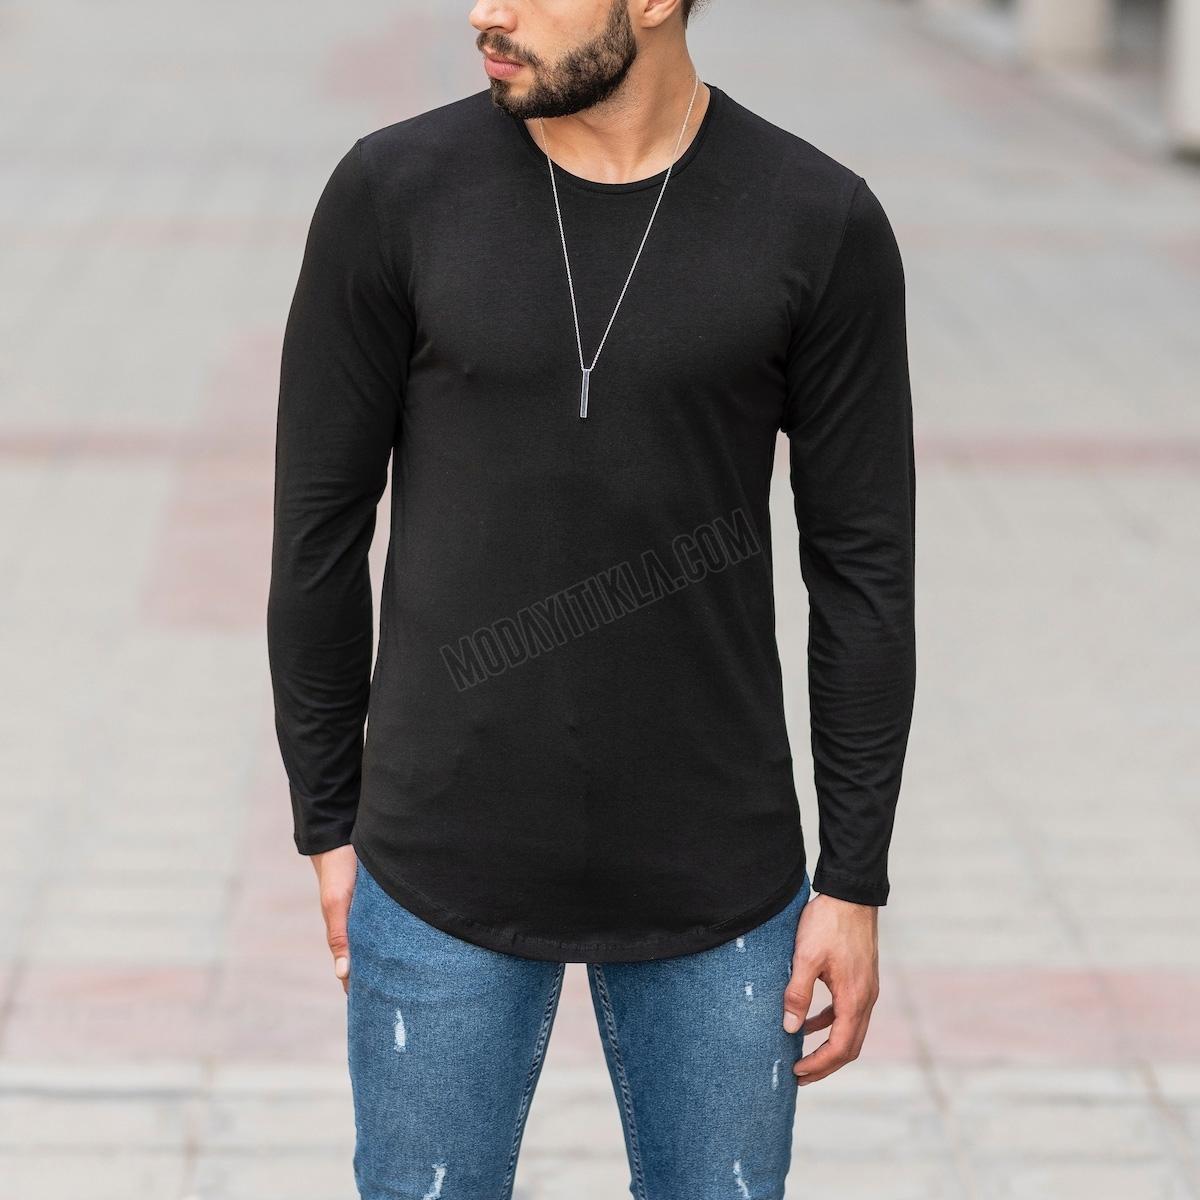 Erkek Uzun Kesim Siyah Sweatshirt